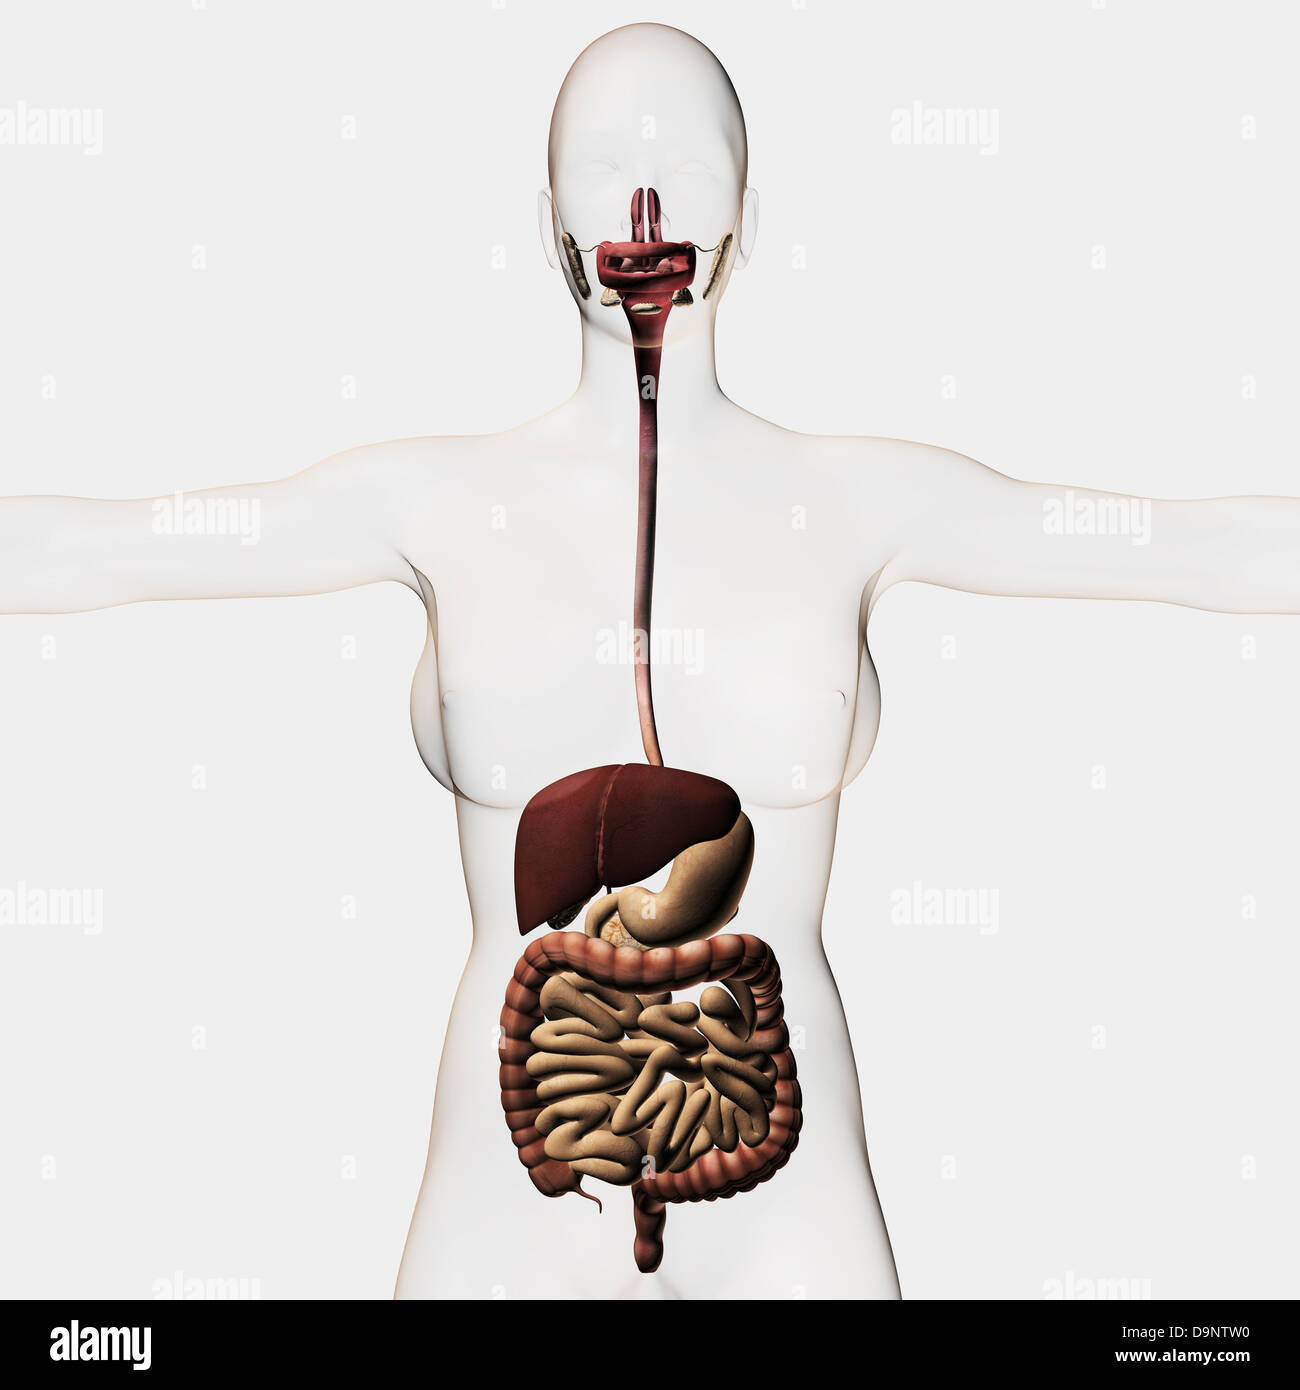 Gastrointestinal Stockfotos & Gastrointestinal Bilder - Alamy